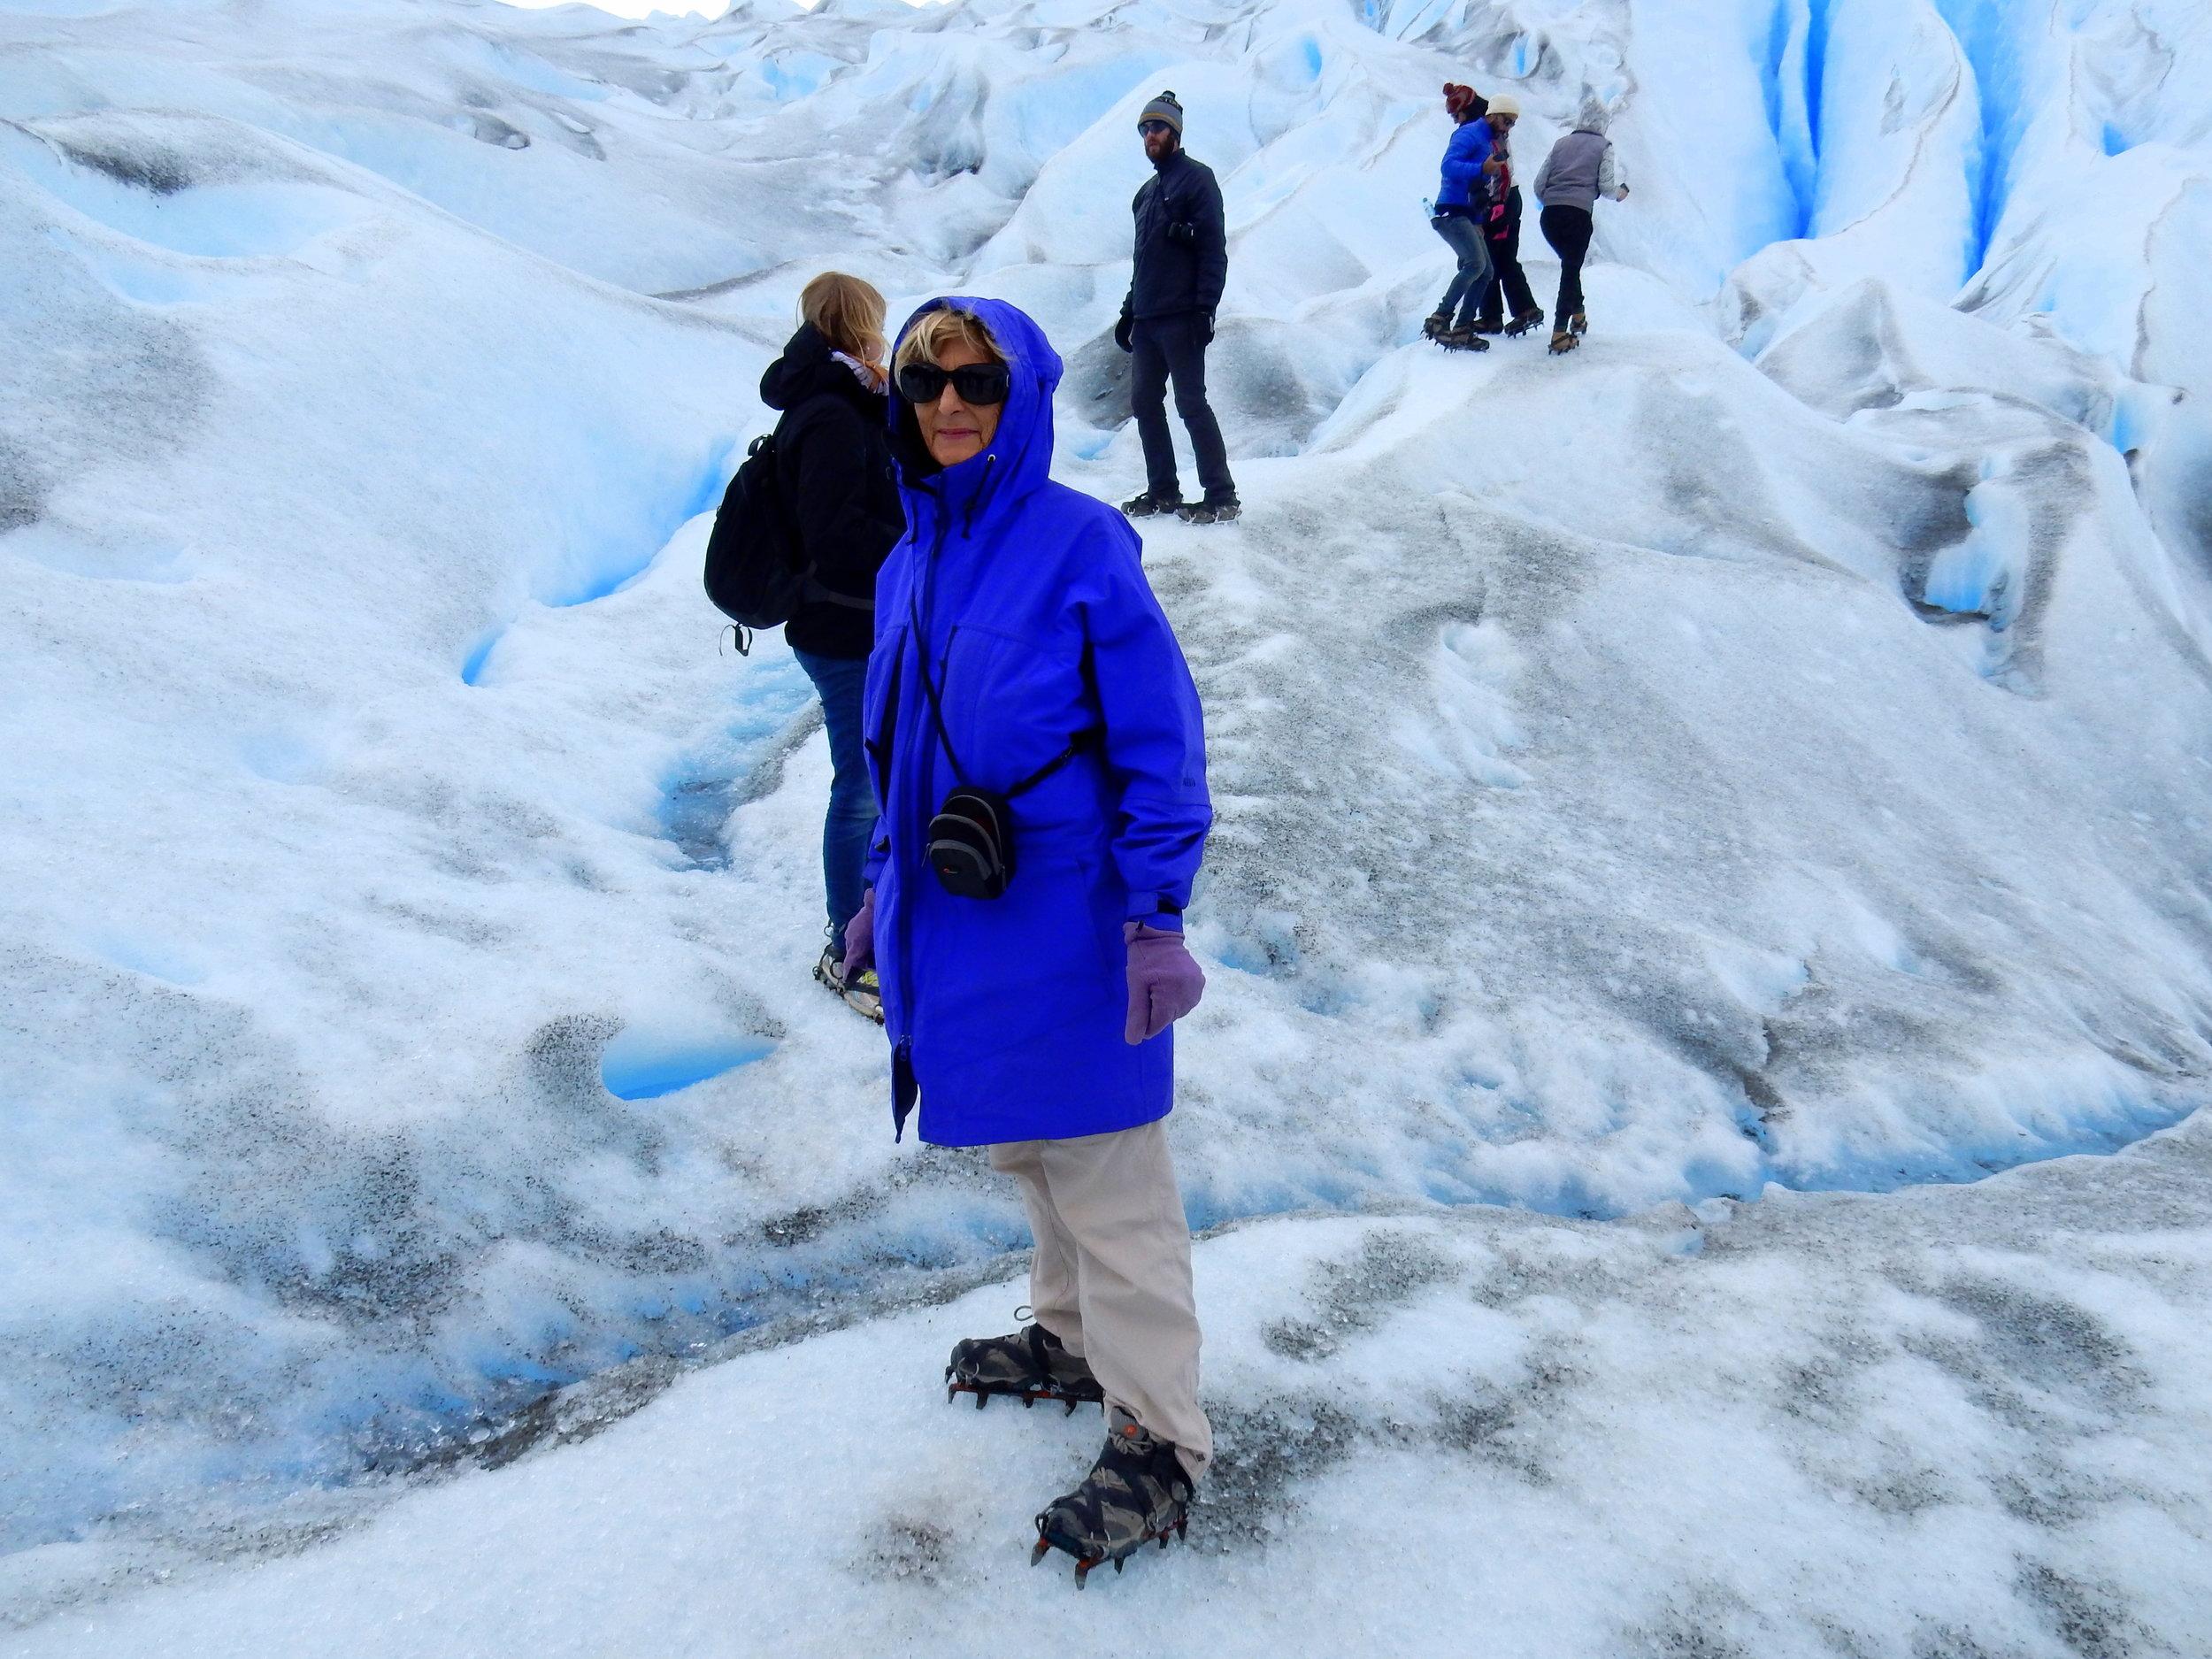 Just getting my glacier legs